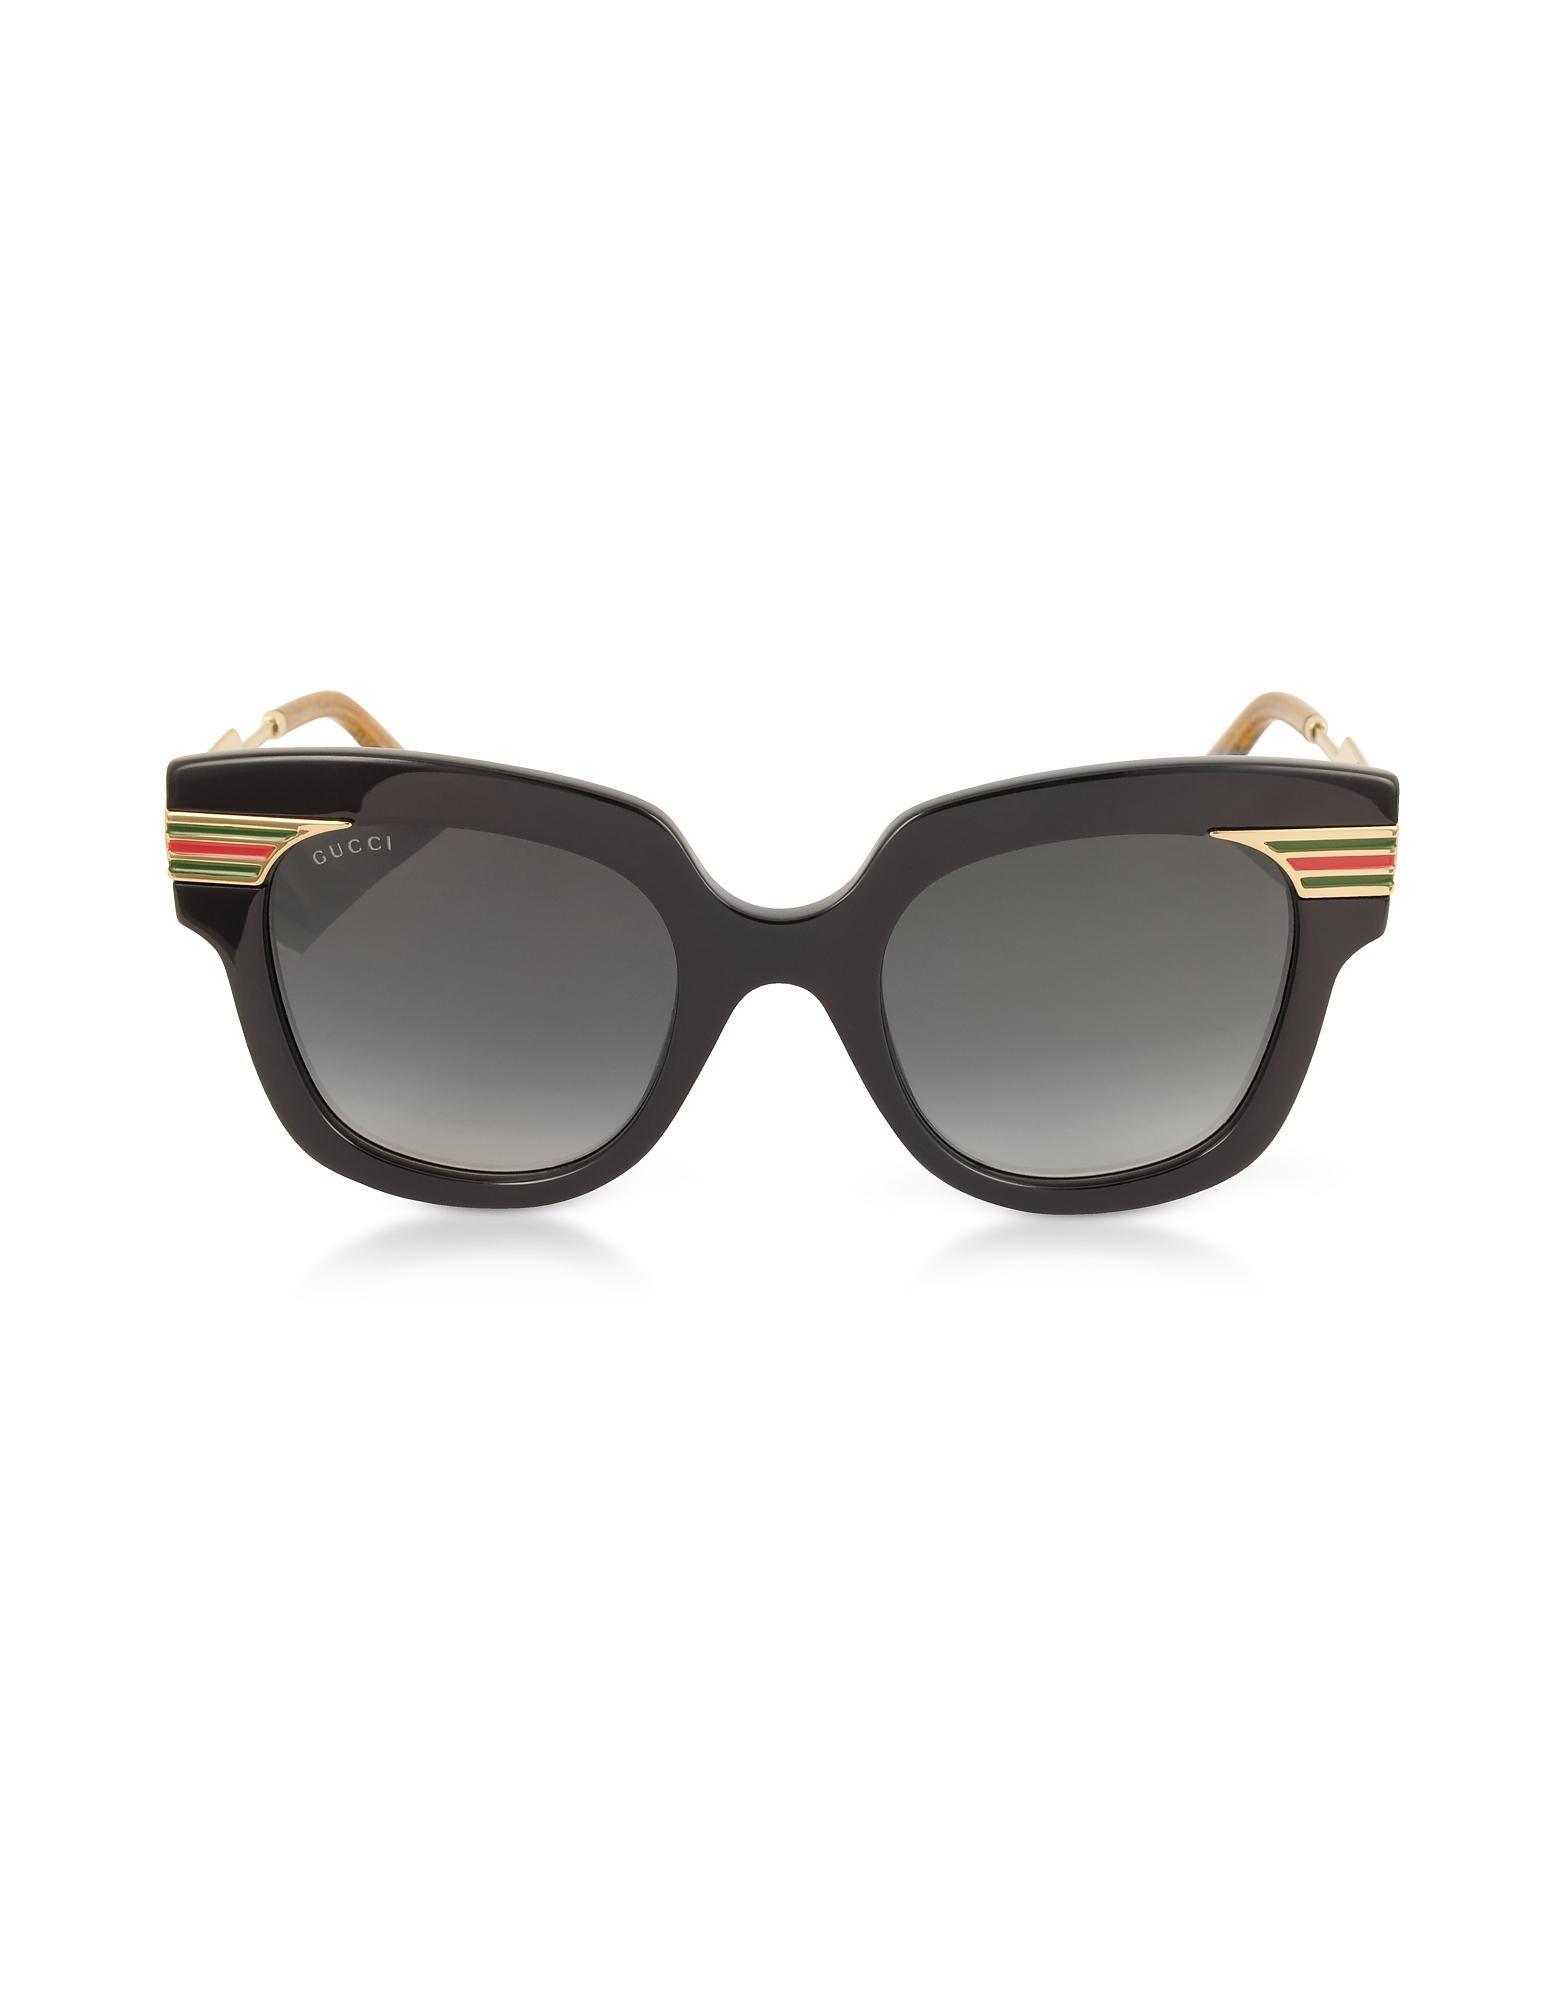 e5e11ee81bb Gucci - GG0281S Square-frame Black Acetate Sunglasses W sylvie Web Temples  - Lyst. View fullscreen